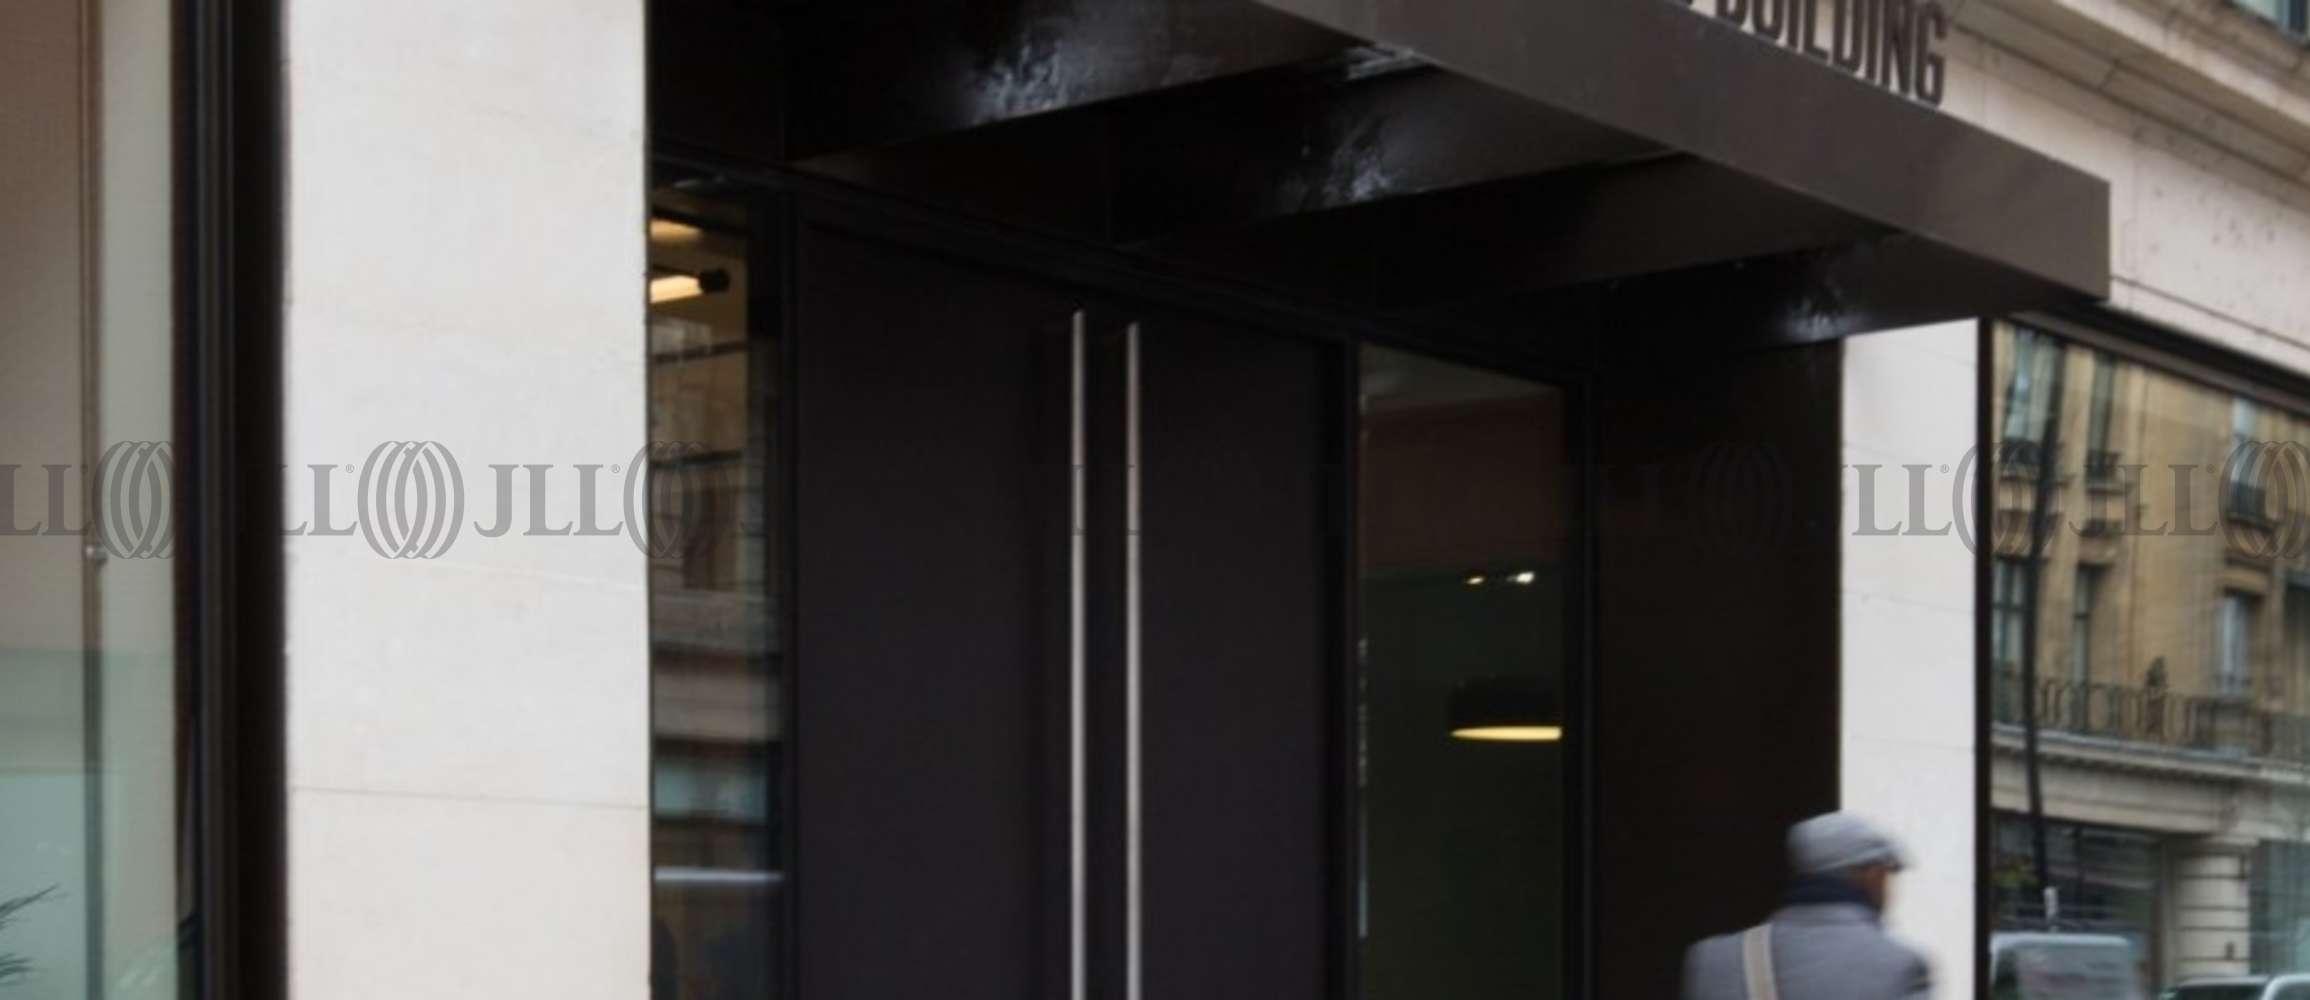 Serviced office London, W1W 5PL - The Smith Building, Great Portland Street